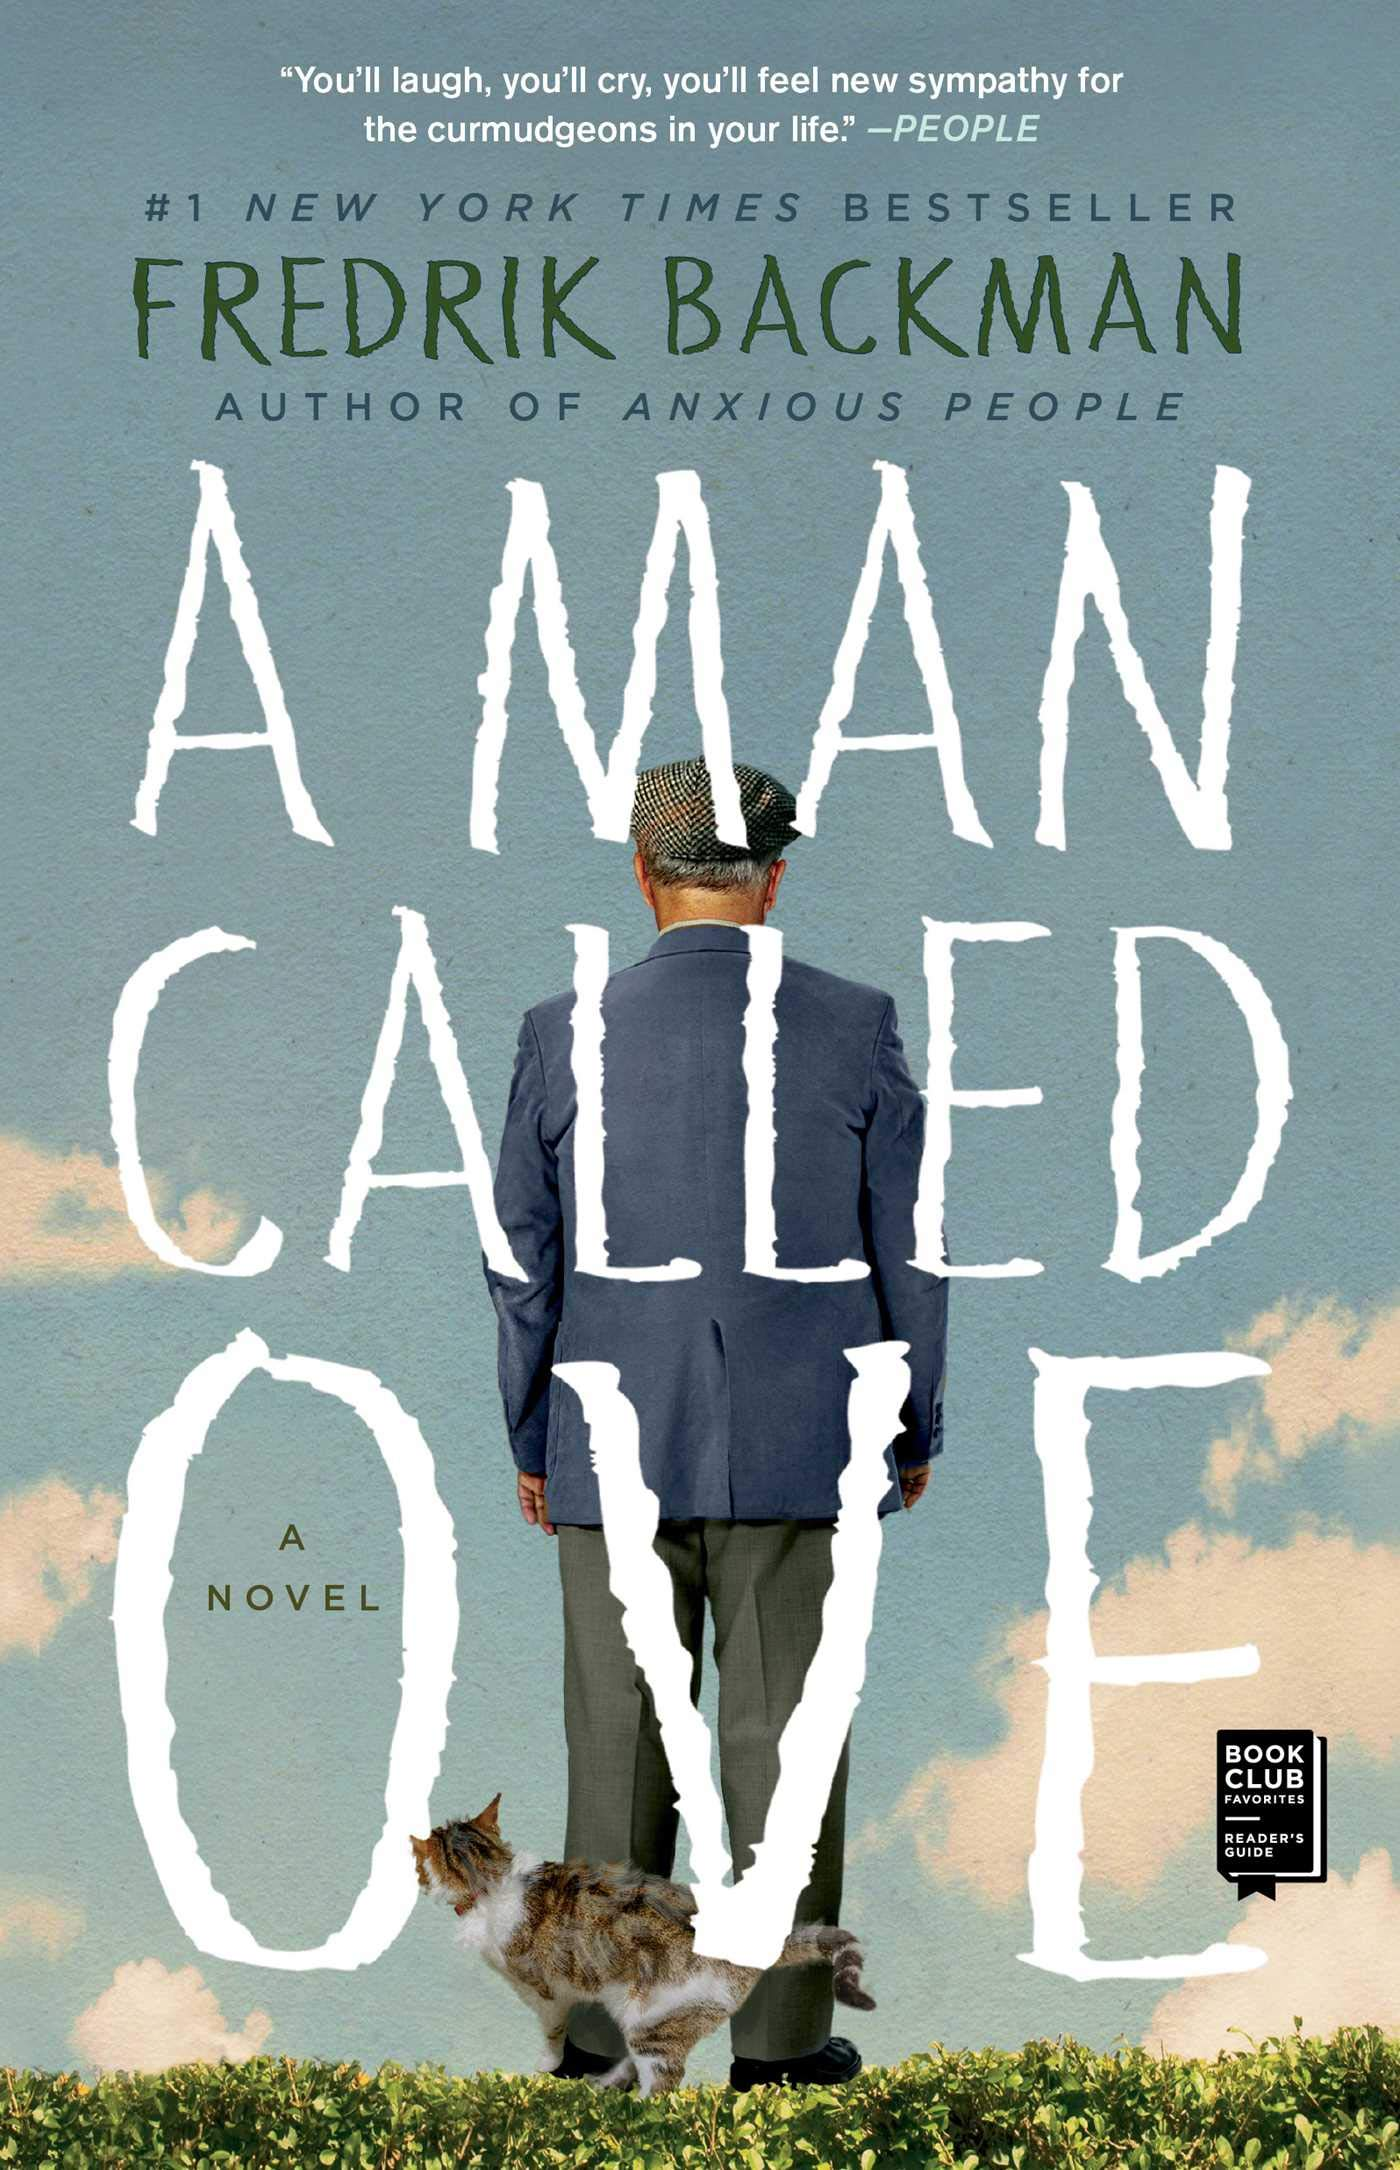 Amazon.com: A Man Called Ove: A Novel (9781476738024): Backman, Fredrik:  Books